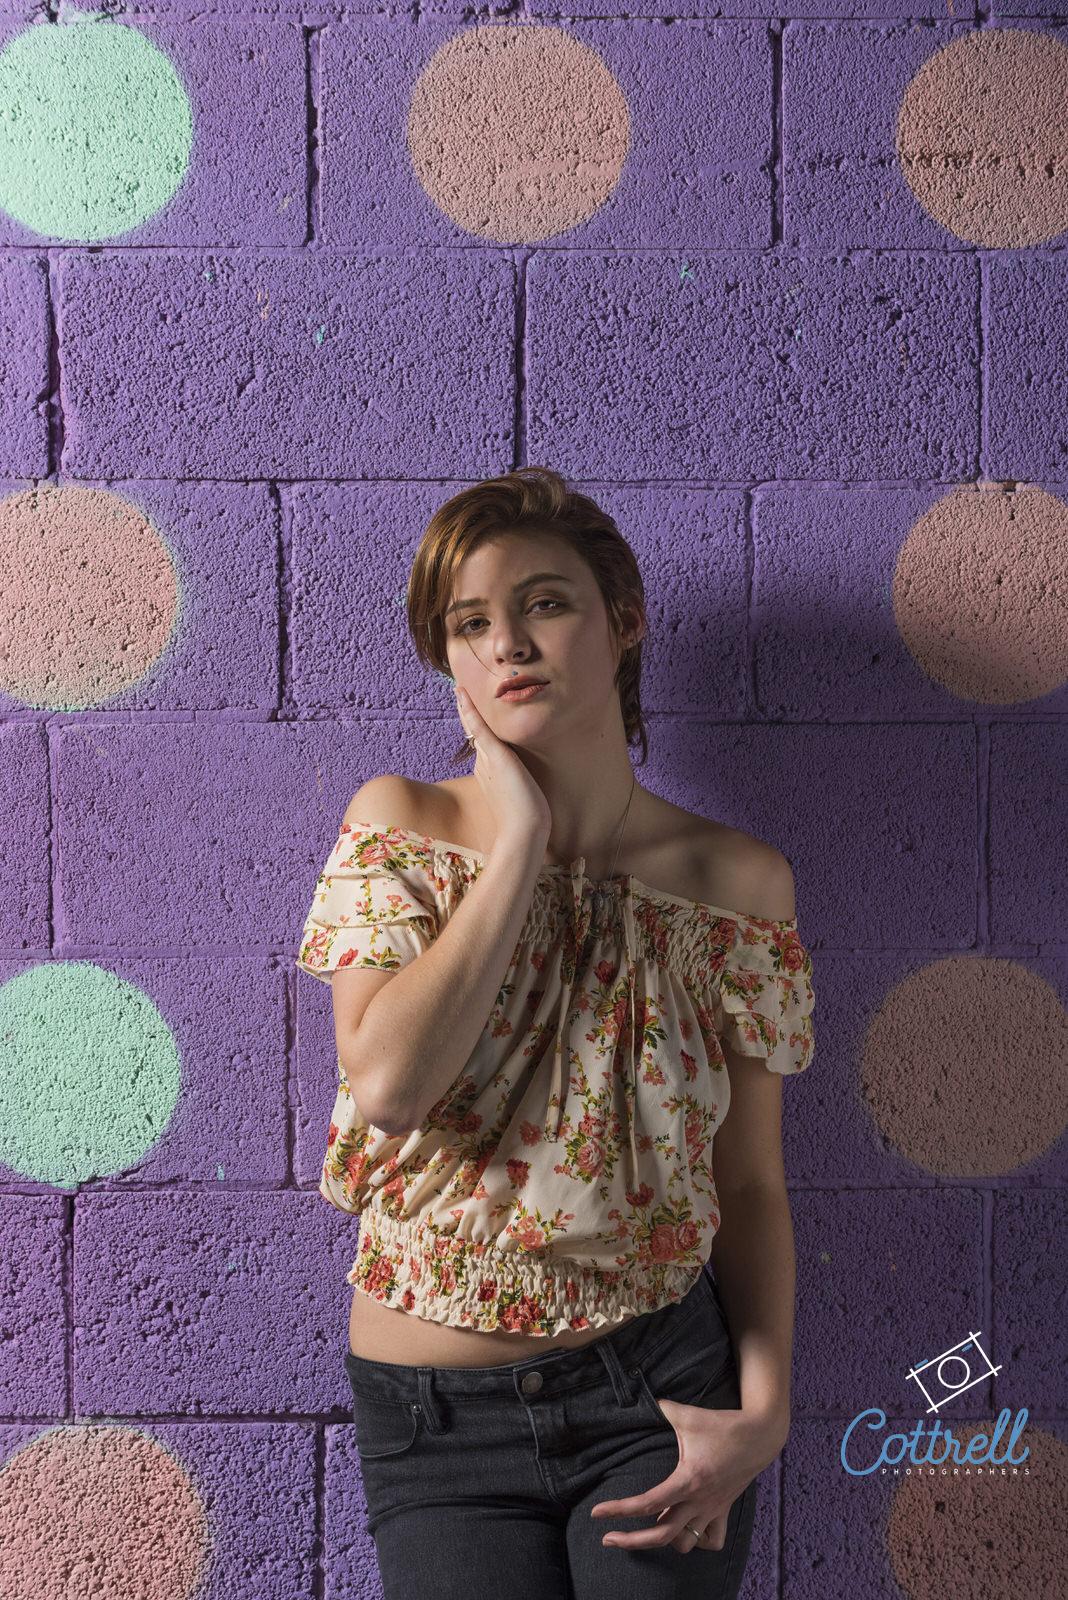 Creative Portrait and Fashion Photography